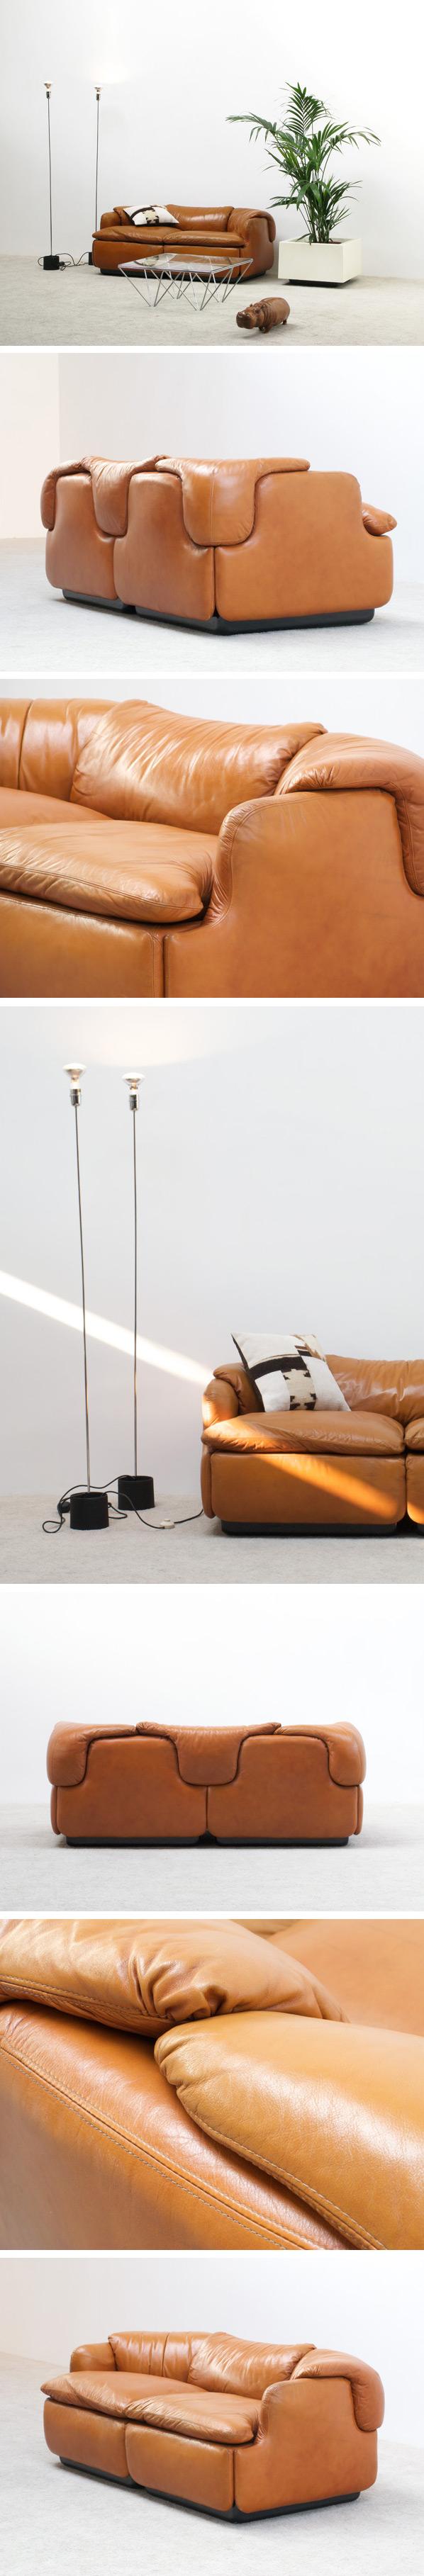 Alberto Rosselli Leather Confidential sofa Saporiti Large